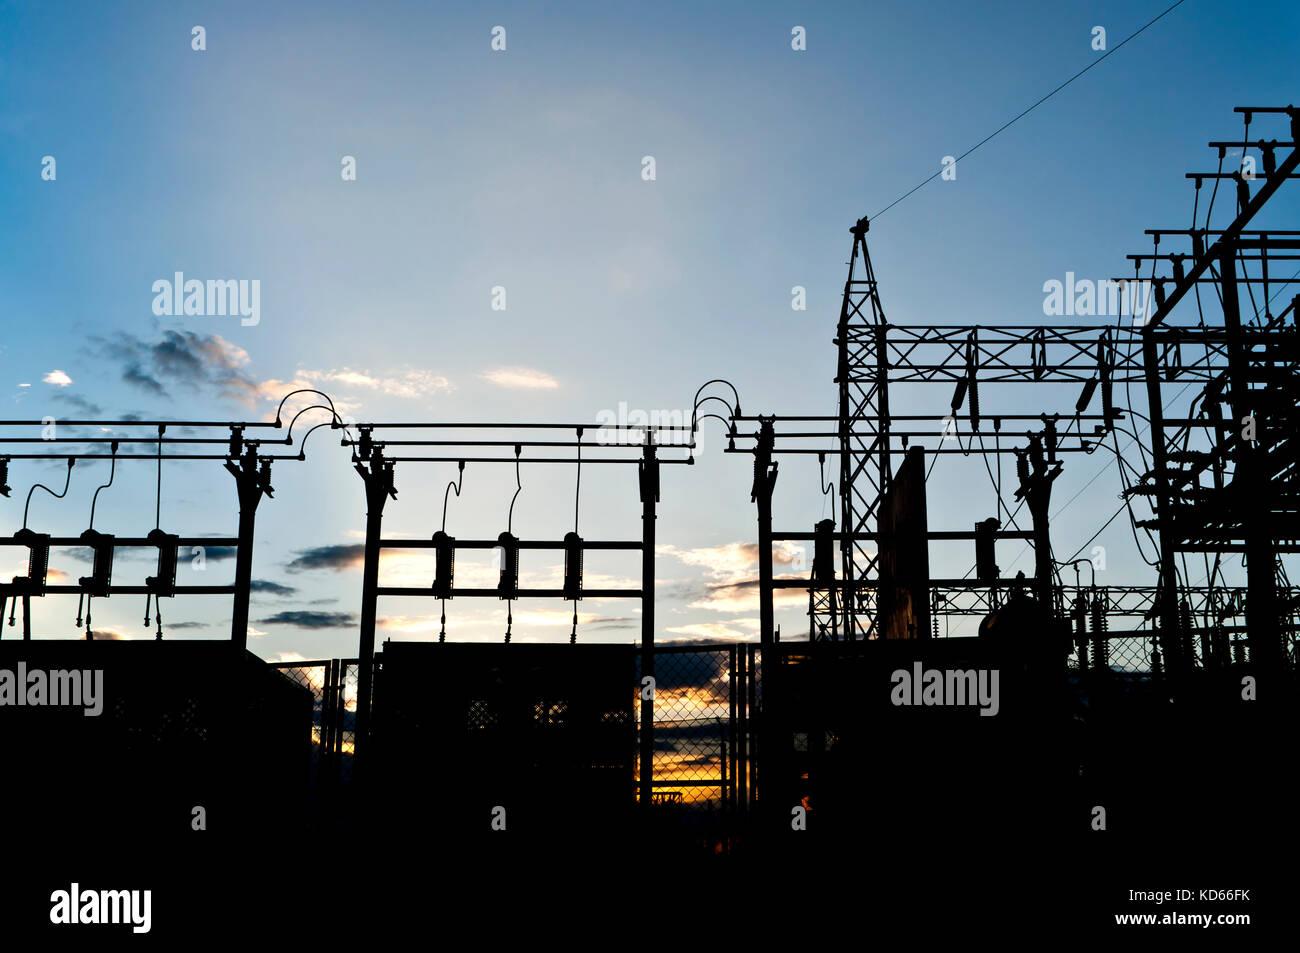 Electrical substation transmission distribution stock for Distribution substation